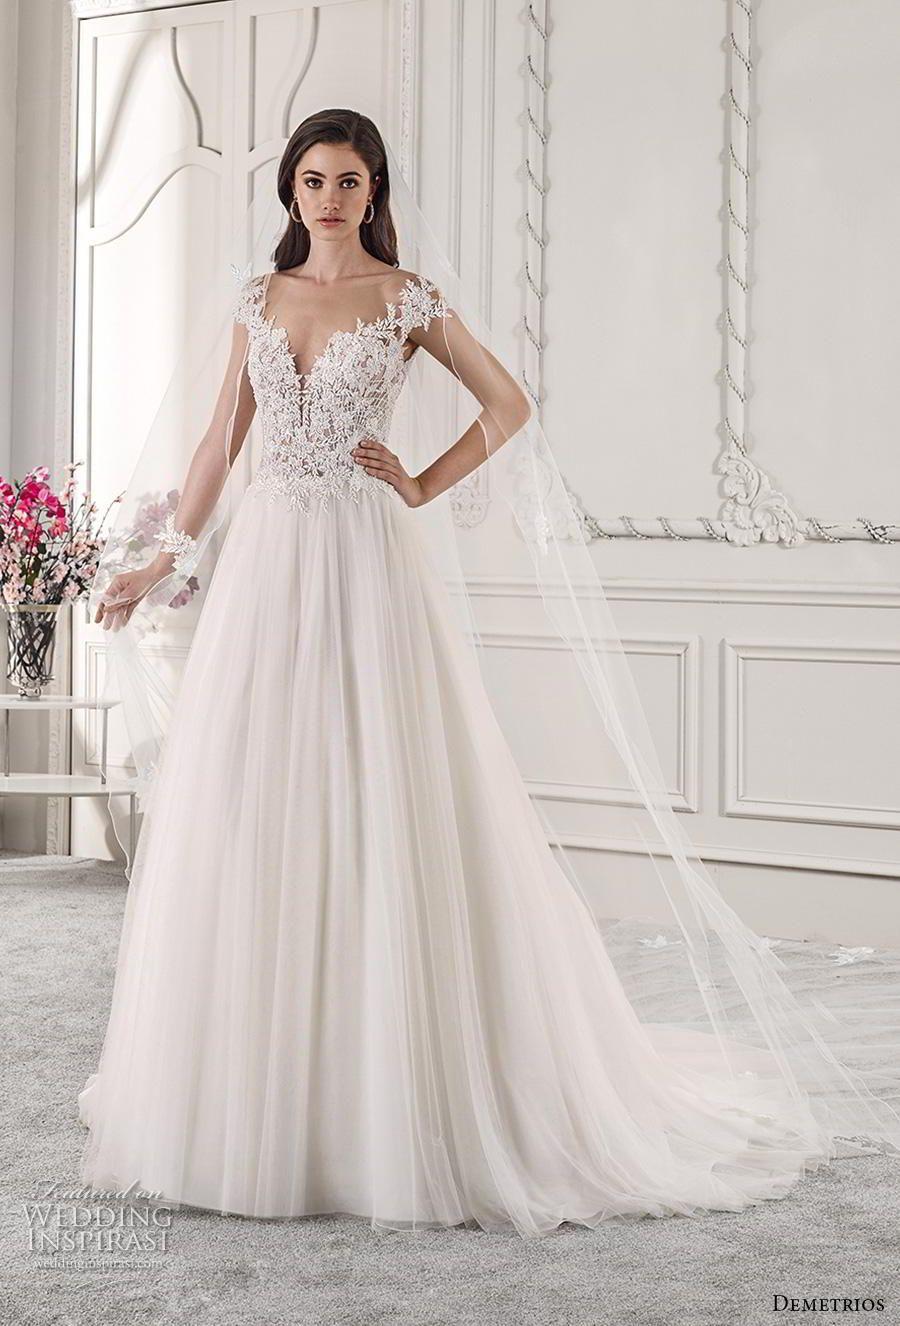 Lace dress zalora may 2019 Demetrios  Wedding Dresses u ucStarlightud Bridal Collection in